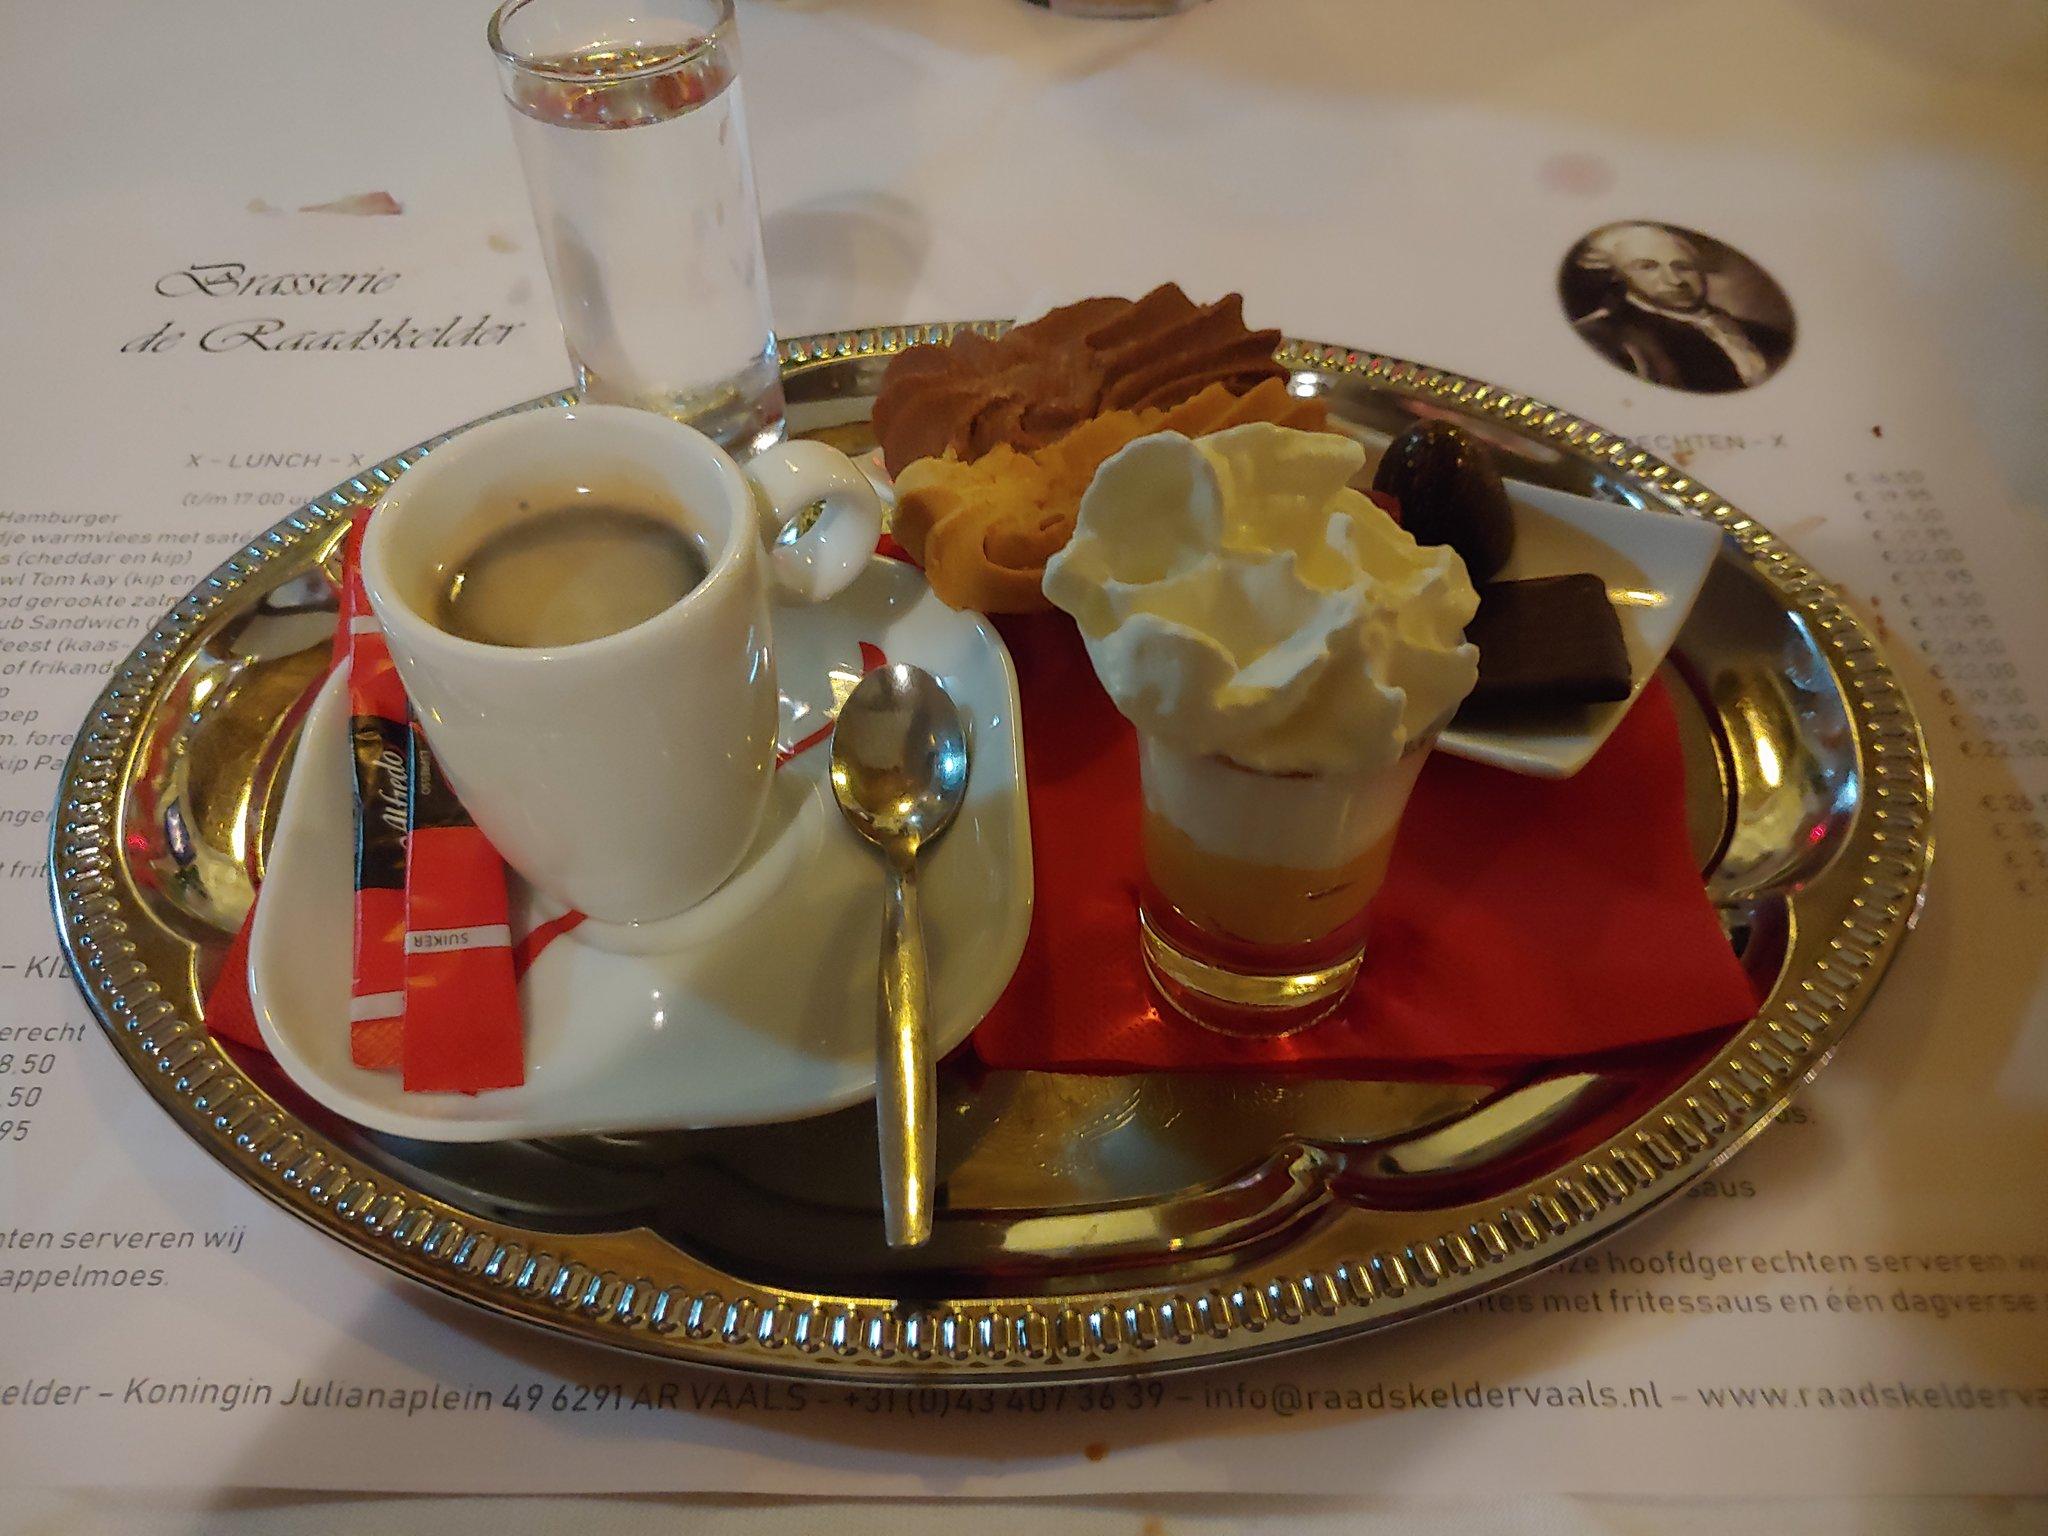 Brasserie de Raadskelder